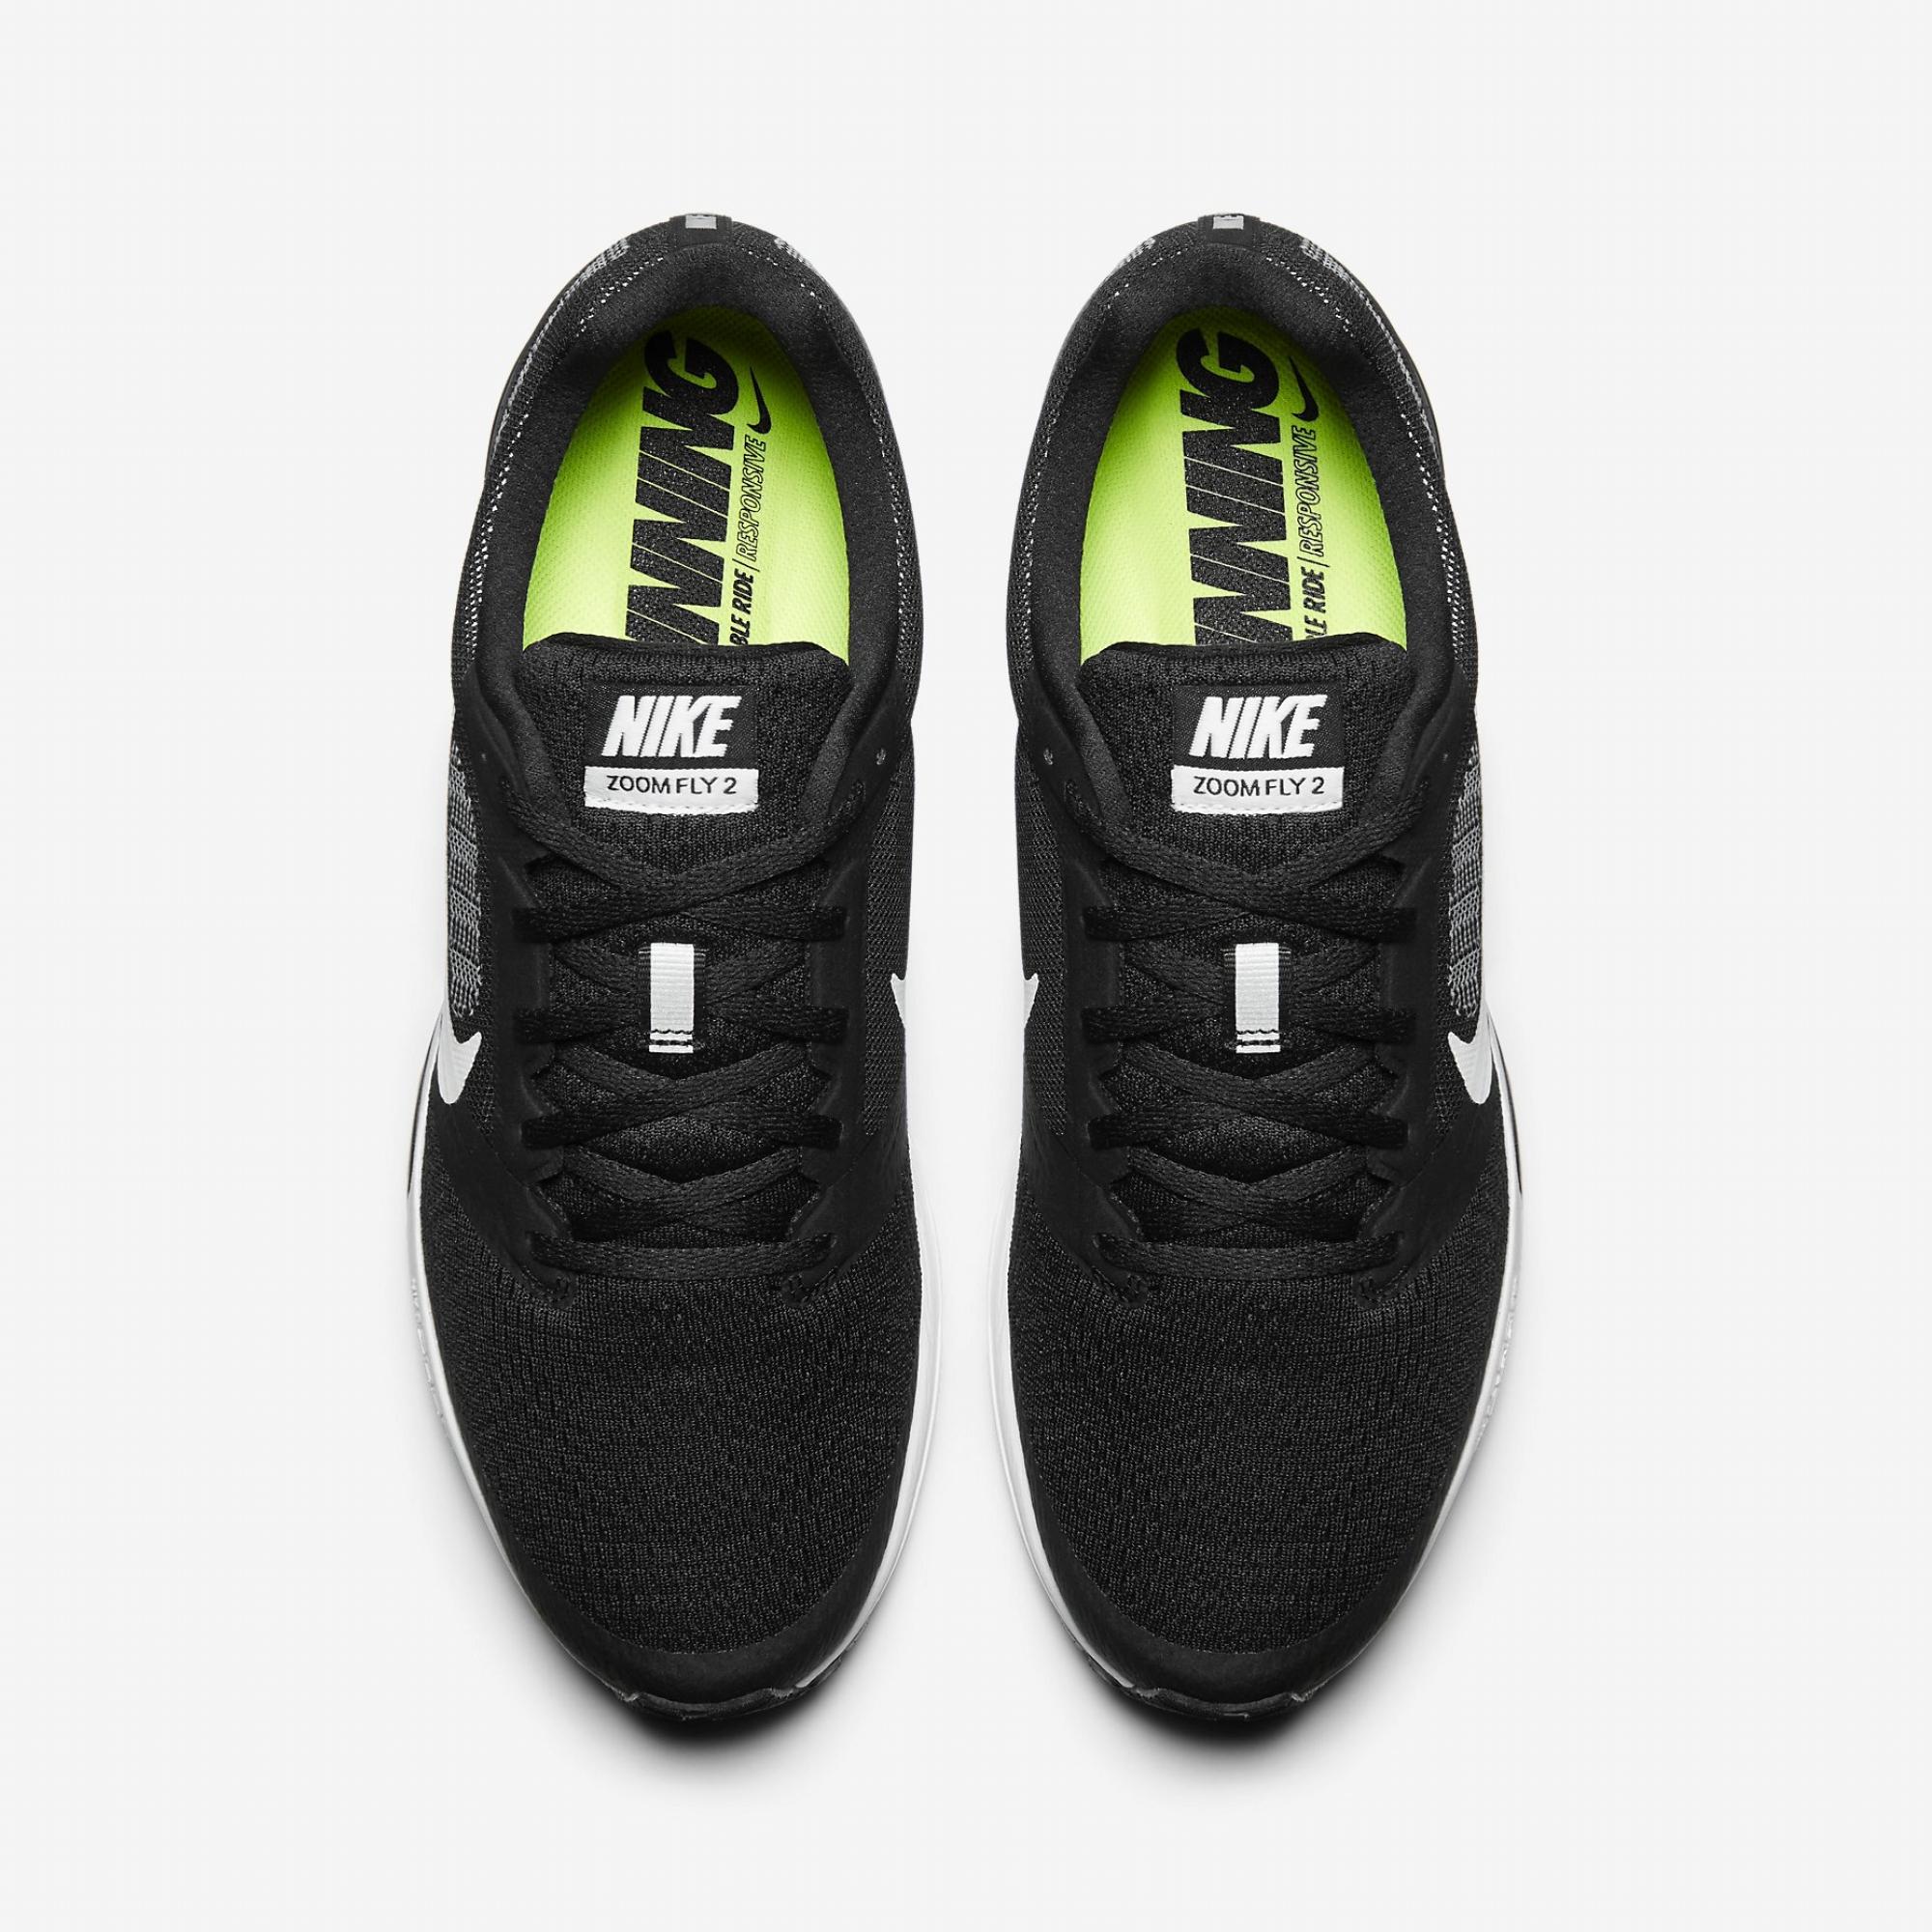 50b004df5caa7 Nike Air Zoom Fly 2 Erkek Spor Ayakkabı  707606-001 - Barcin.com